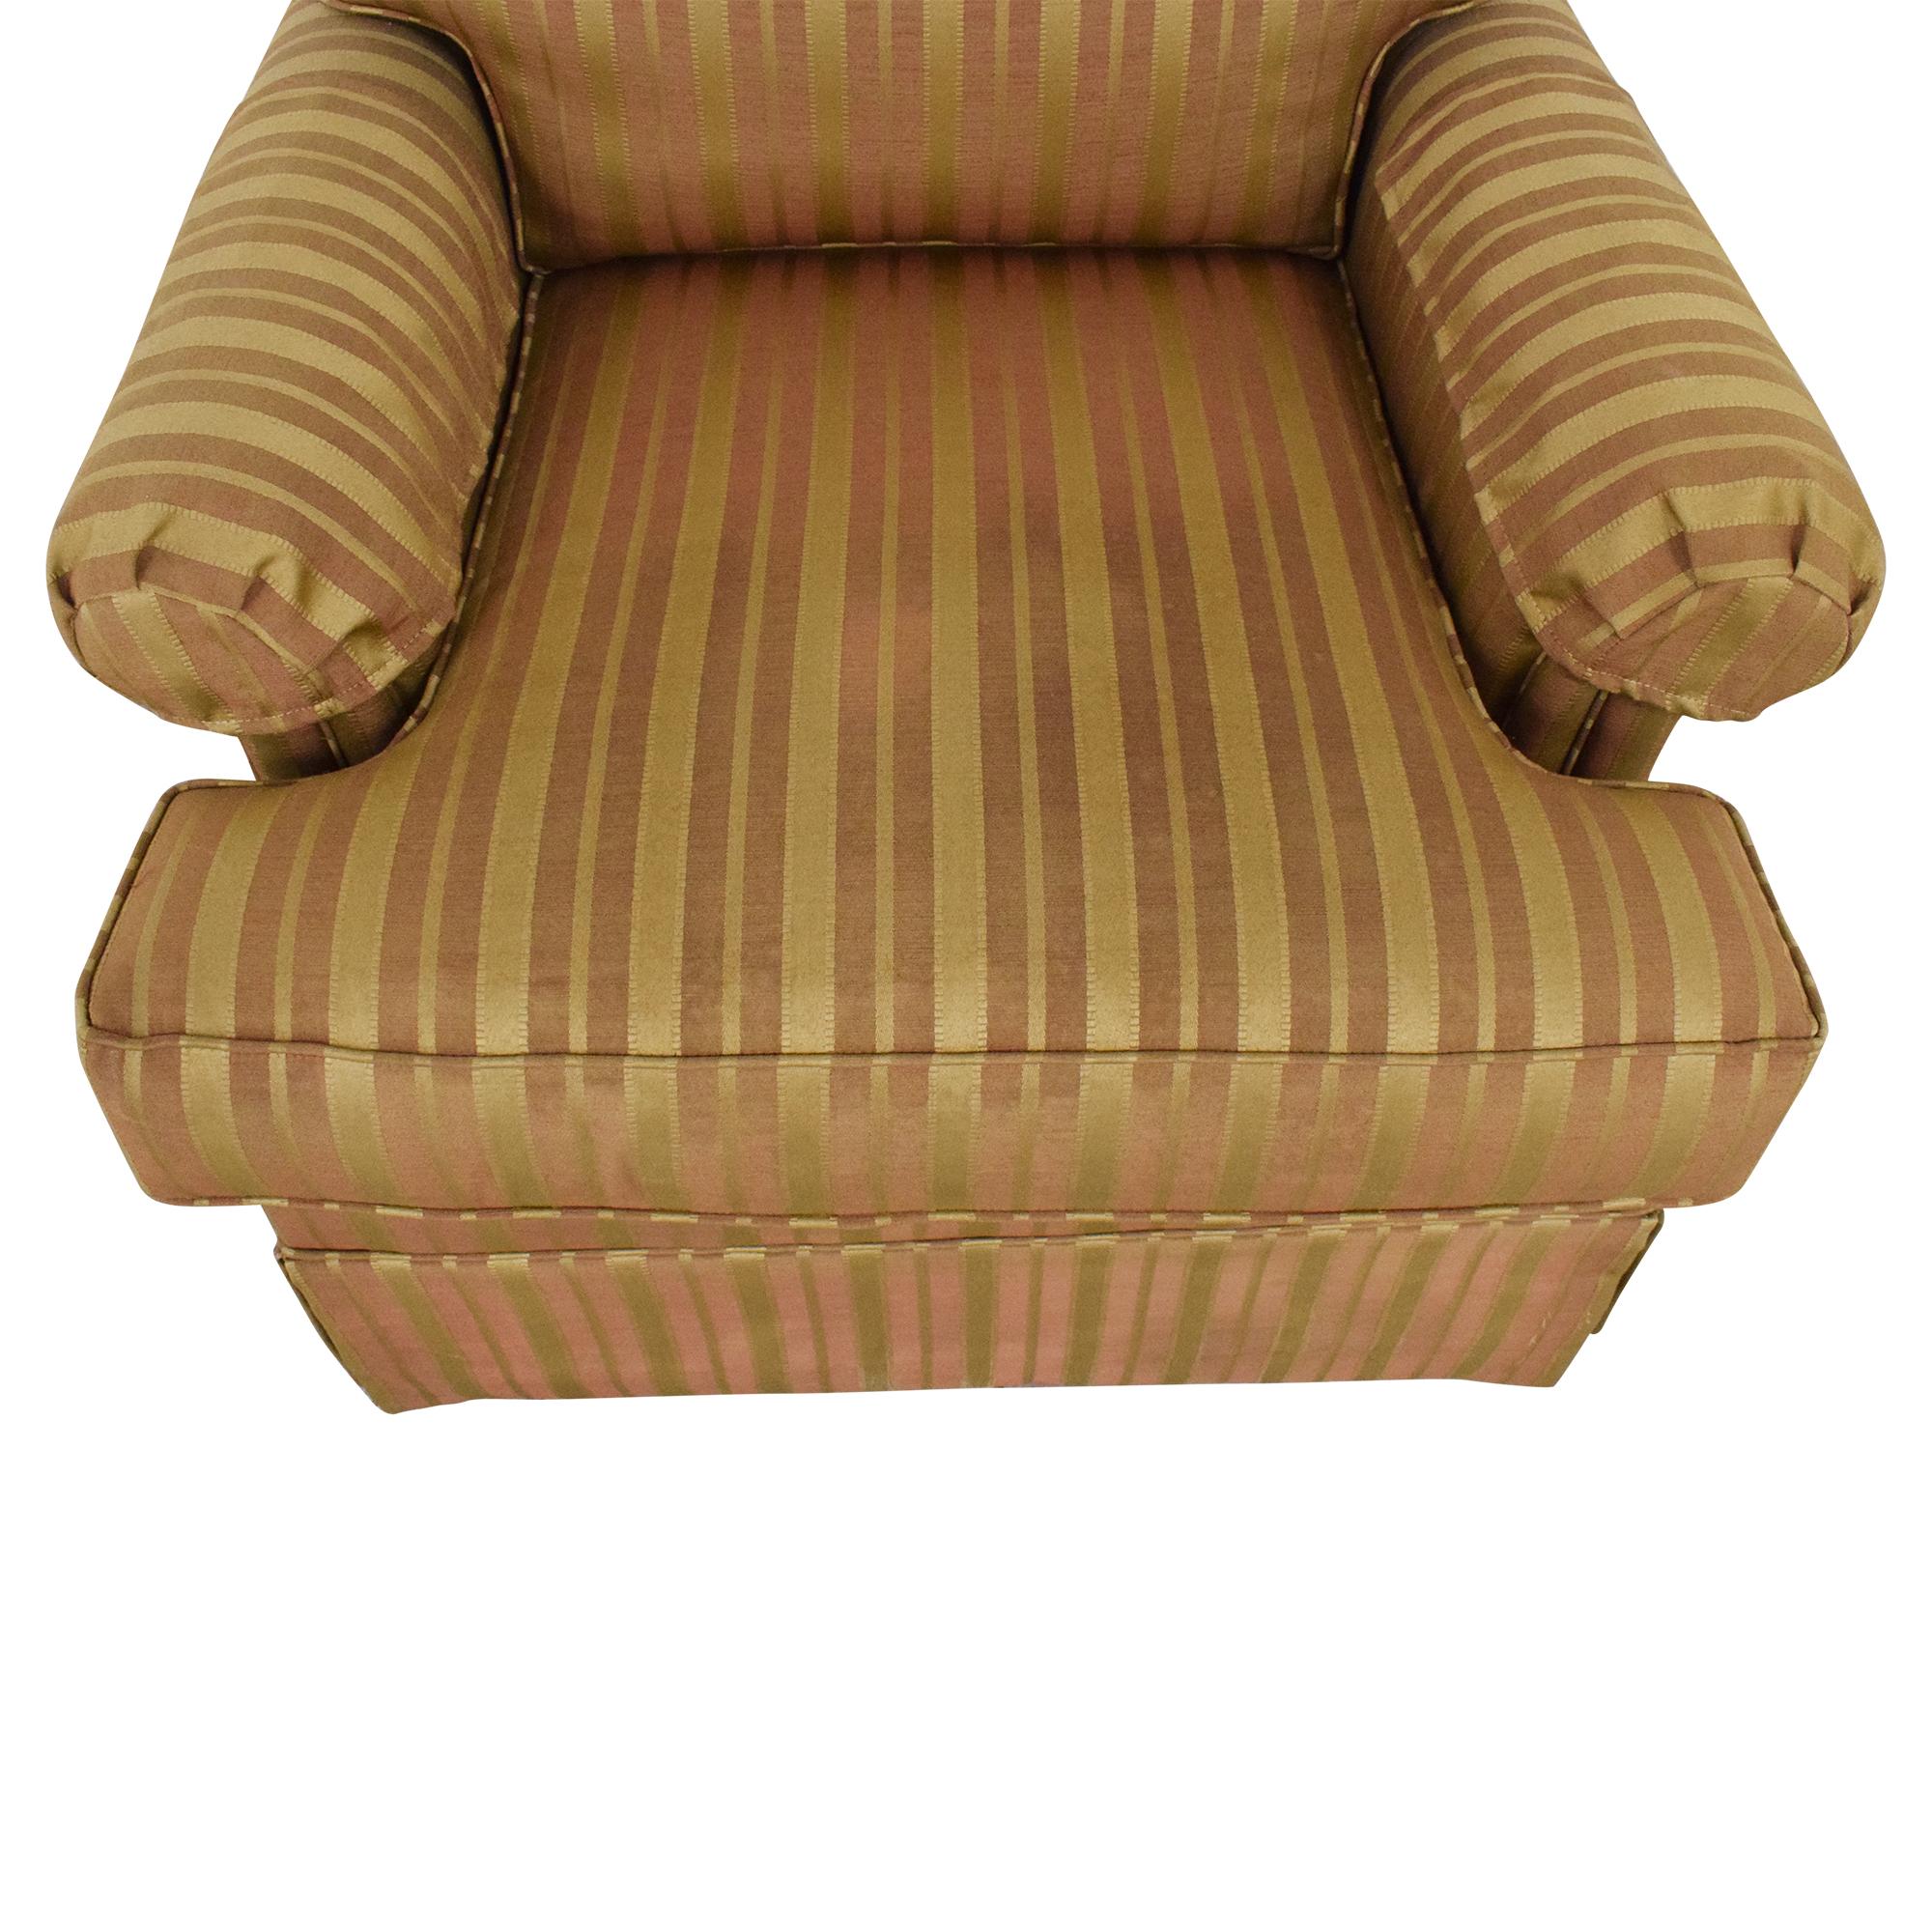 Ethan Allen Mr. Chair / Accent Chairs